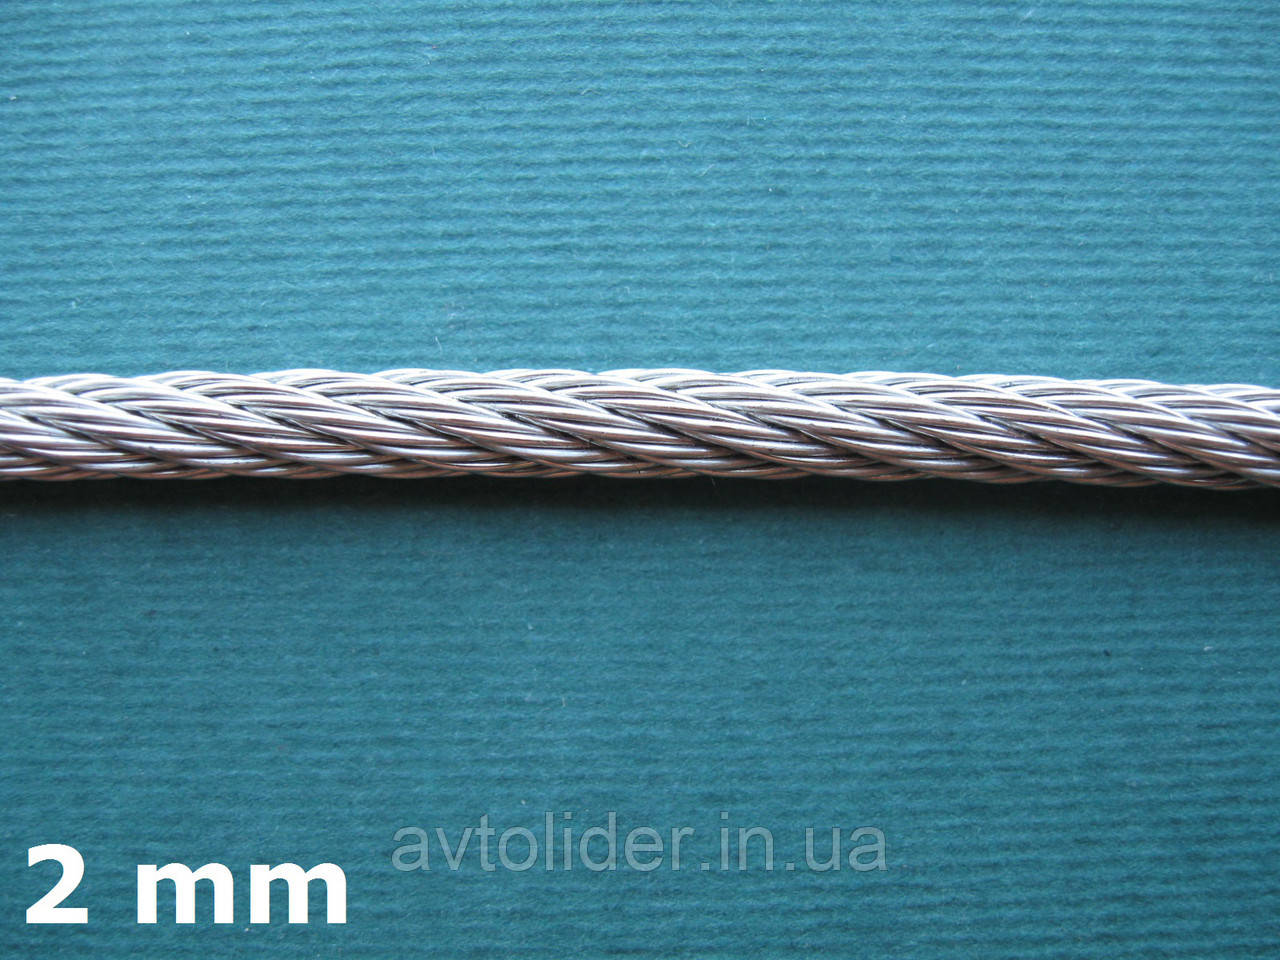 Нержавеющий трос А4, плетение 7х7, диаметр 2 мм